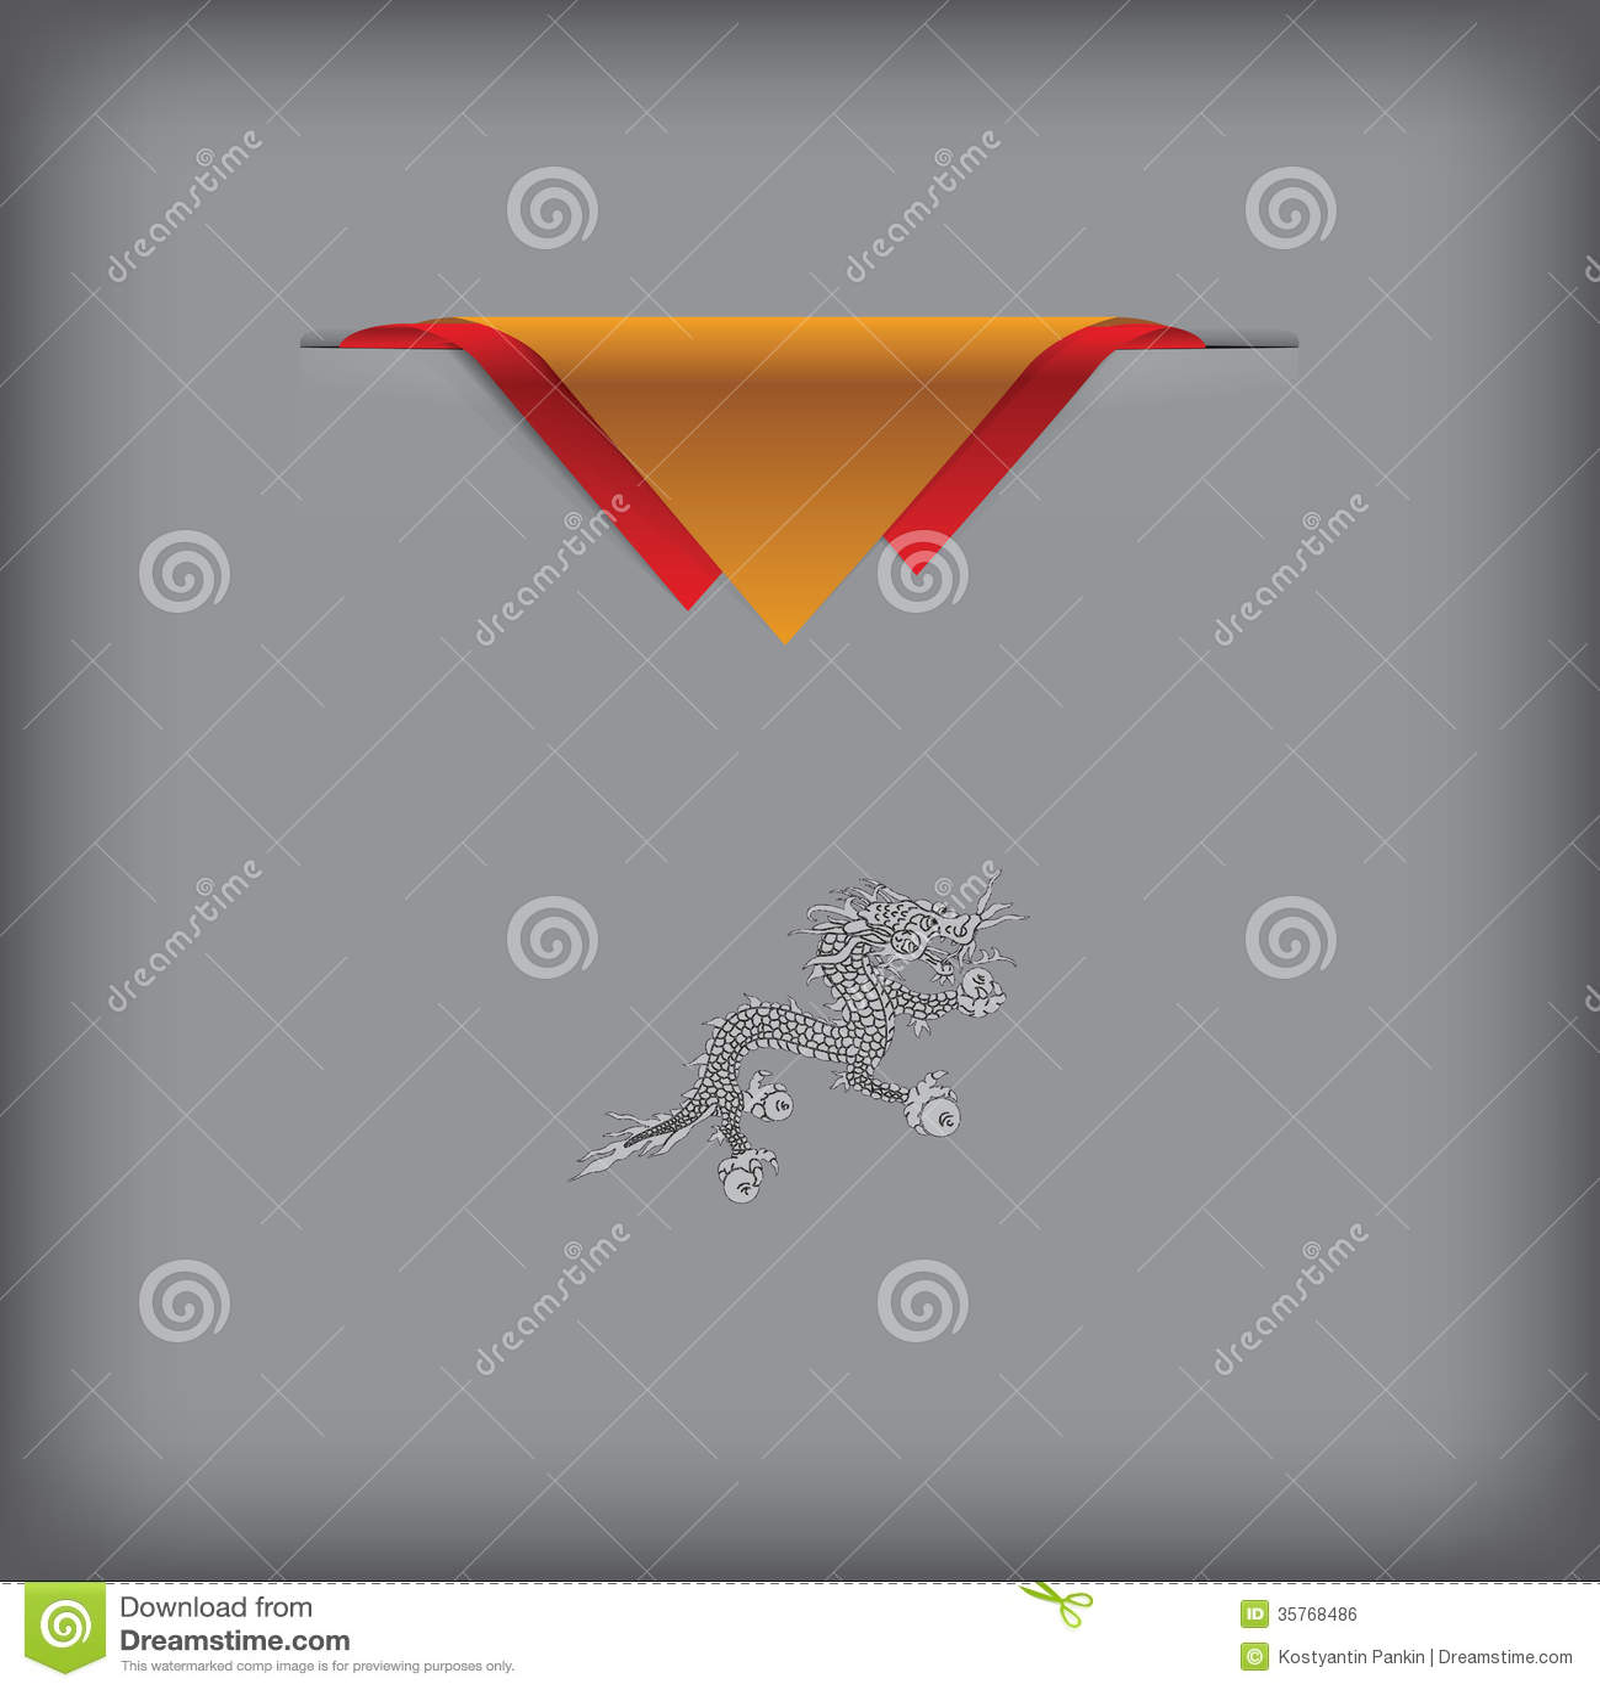 State Symbols Of Bhutan Stock Vector Illustration Of Symbol 35768486